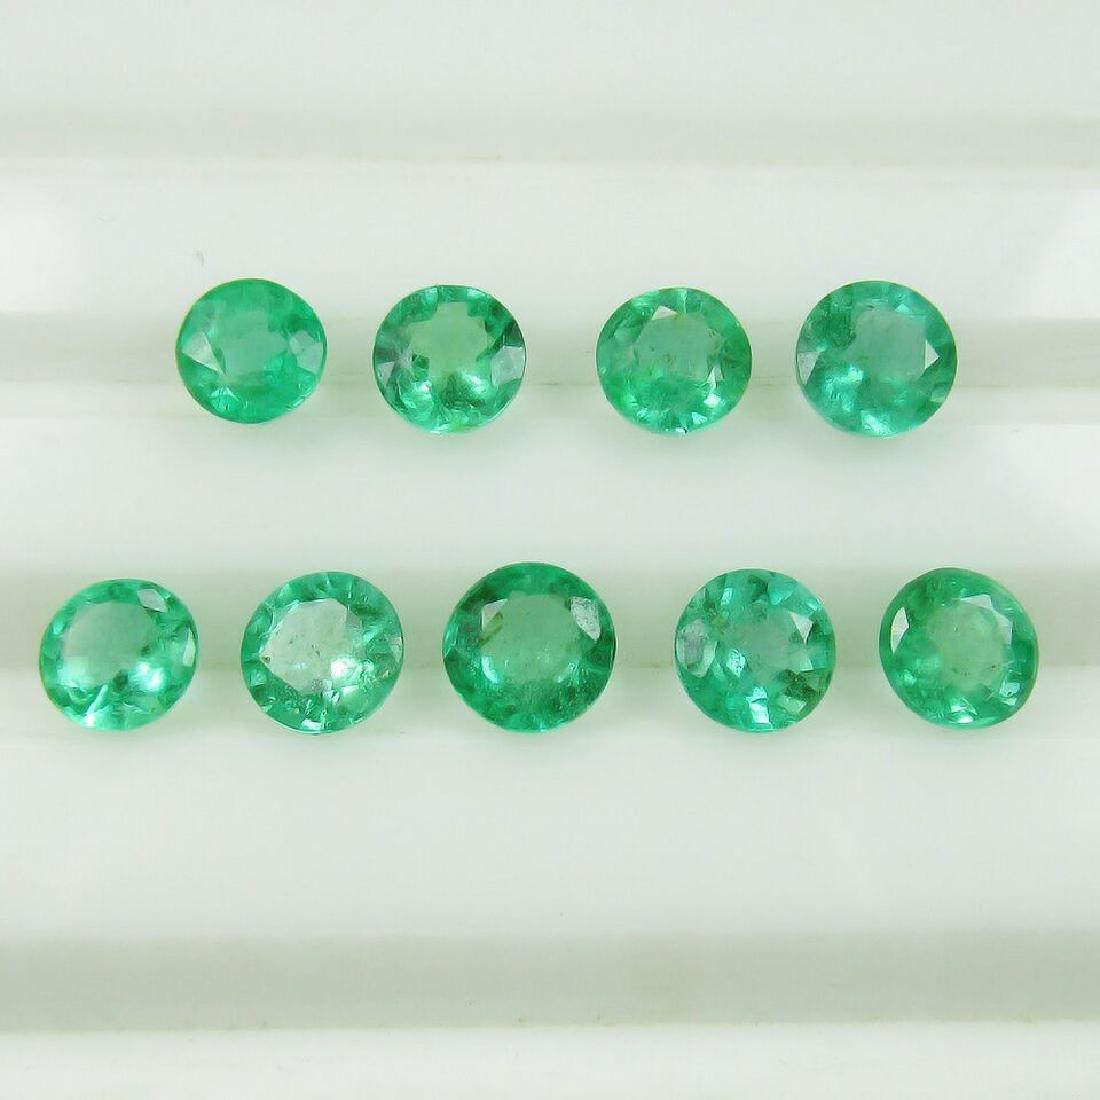 2.98 Carat 9 Loose Round Emeralds Necklace Set - 3